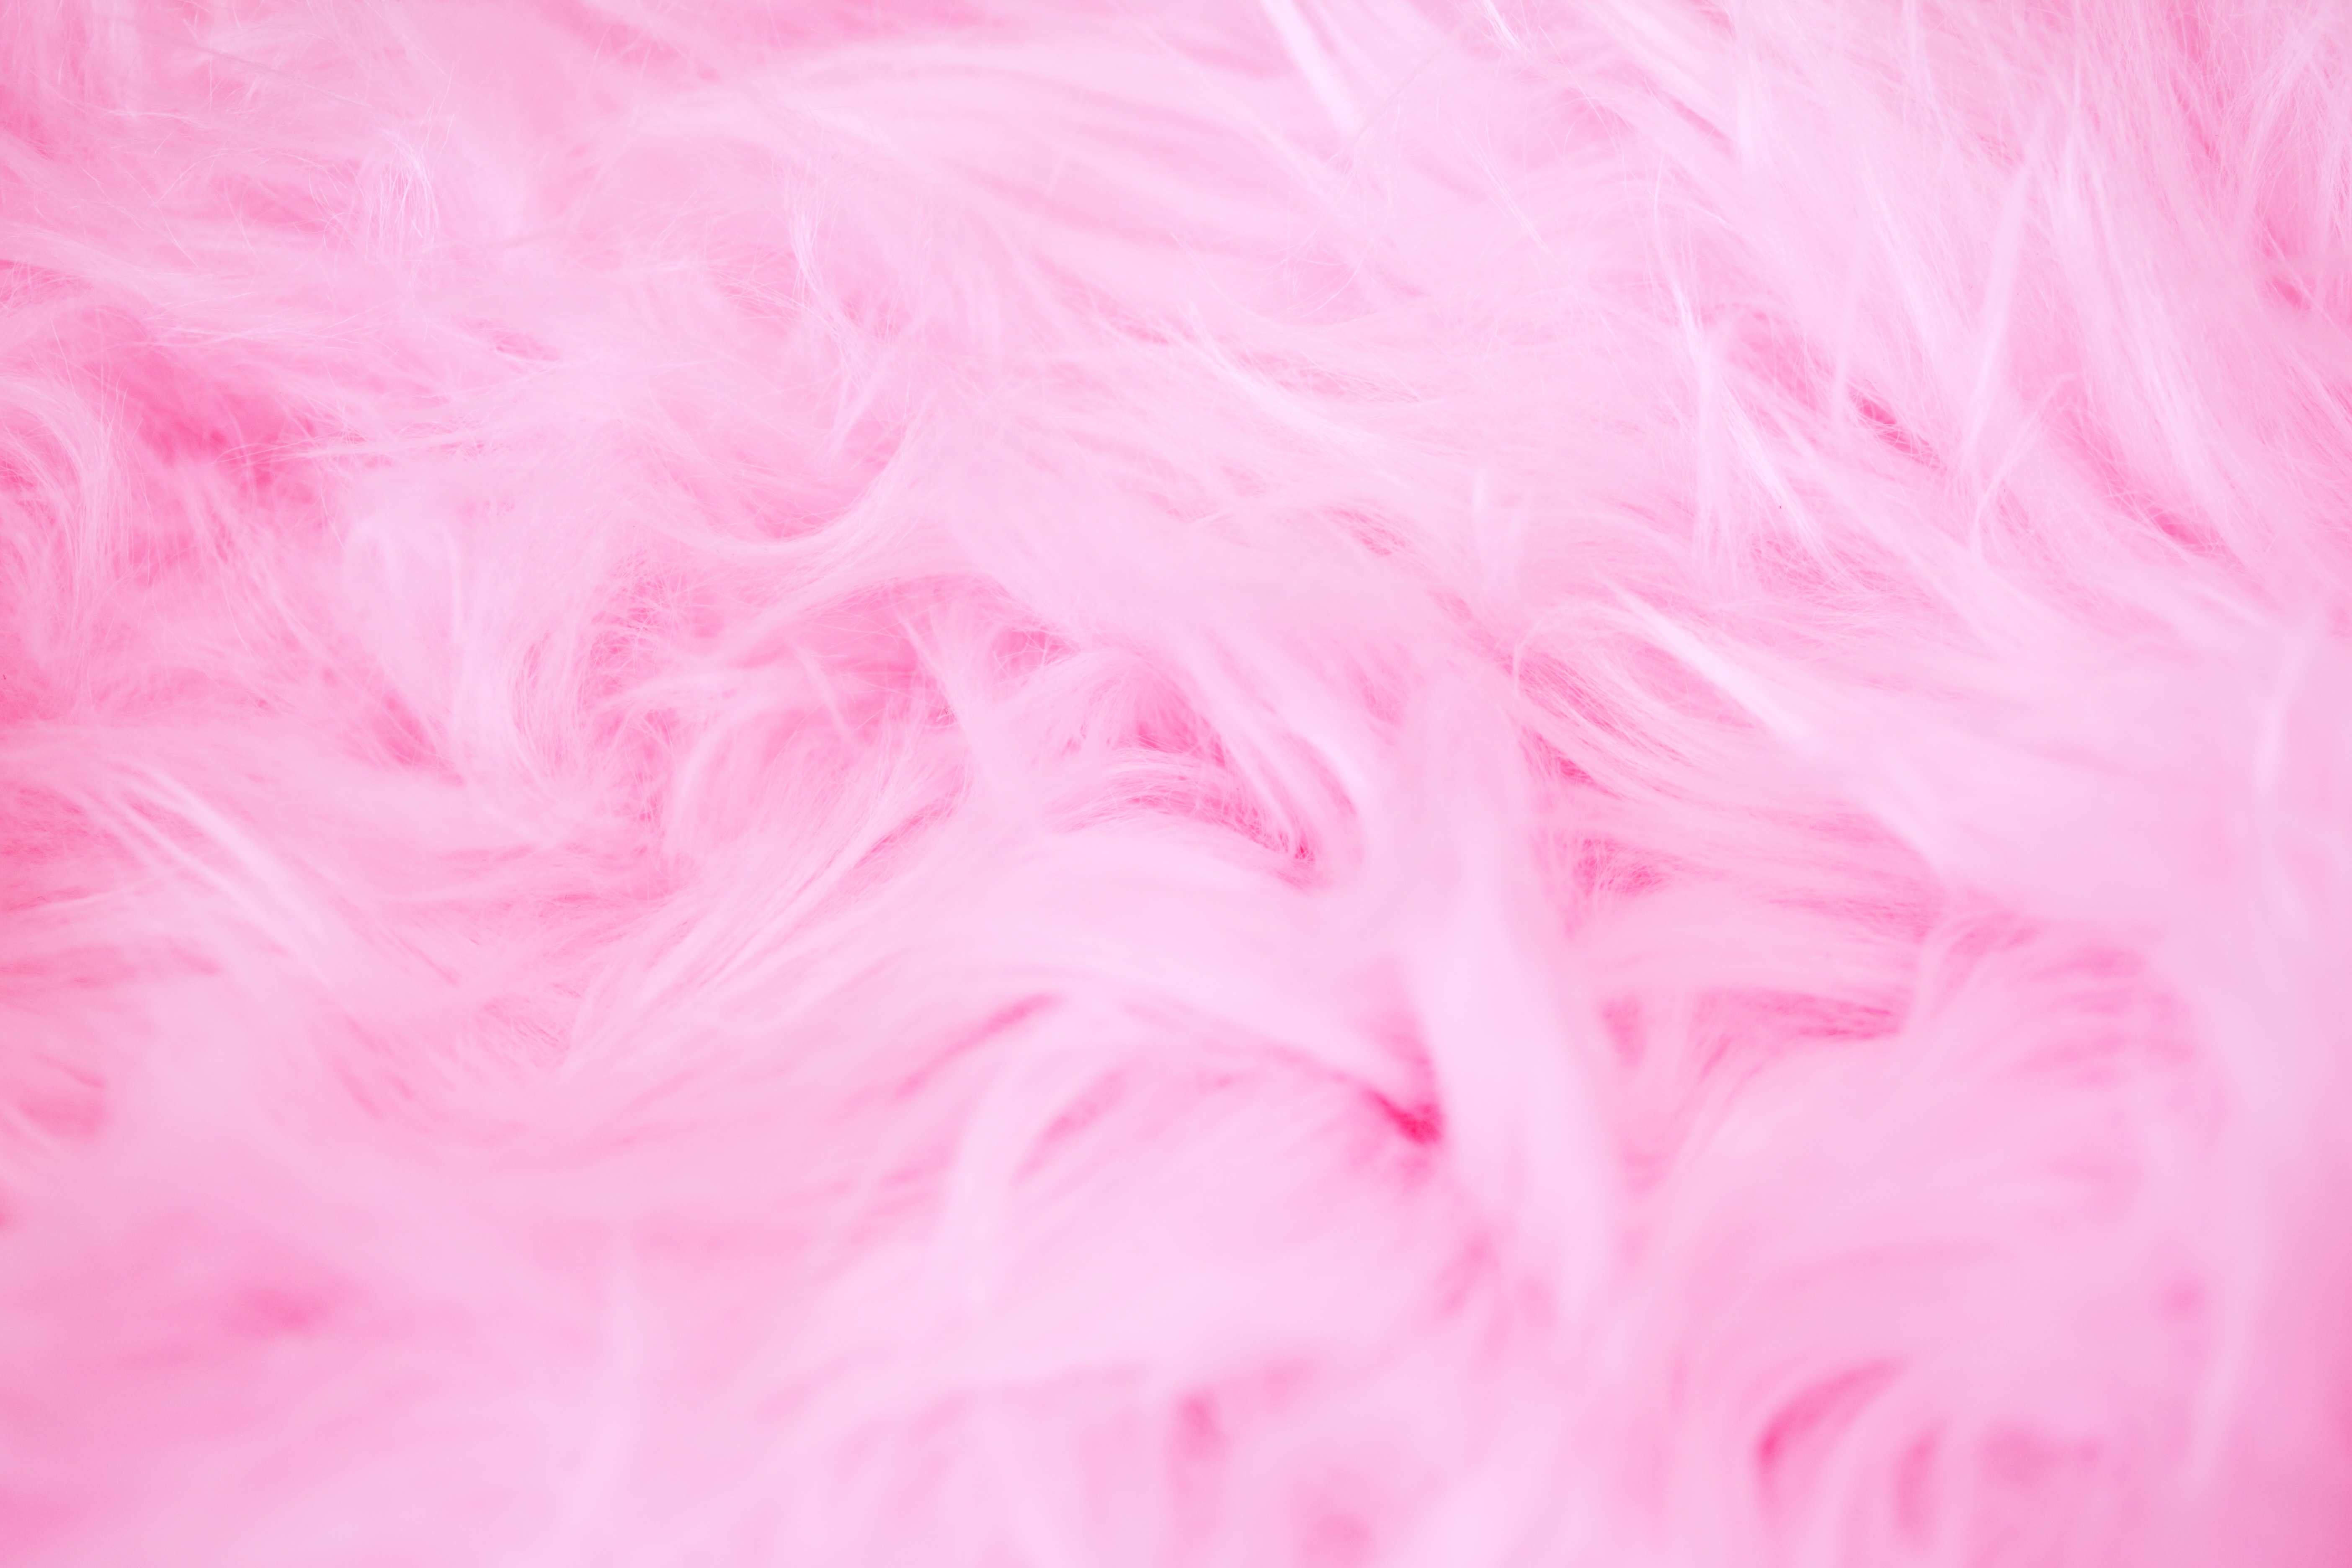 Girly Wallpapers HD Download [500 HQ] Unsplash 5616x3744